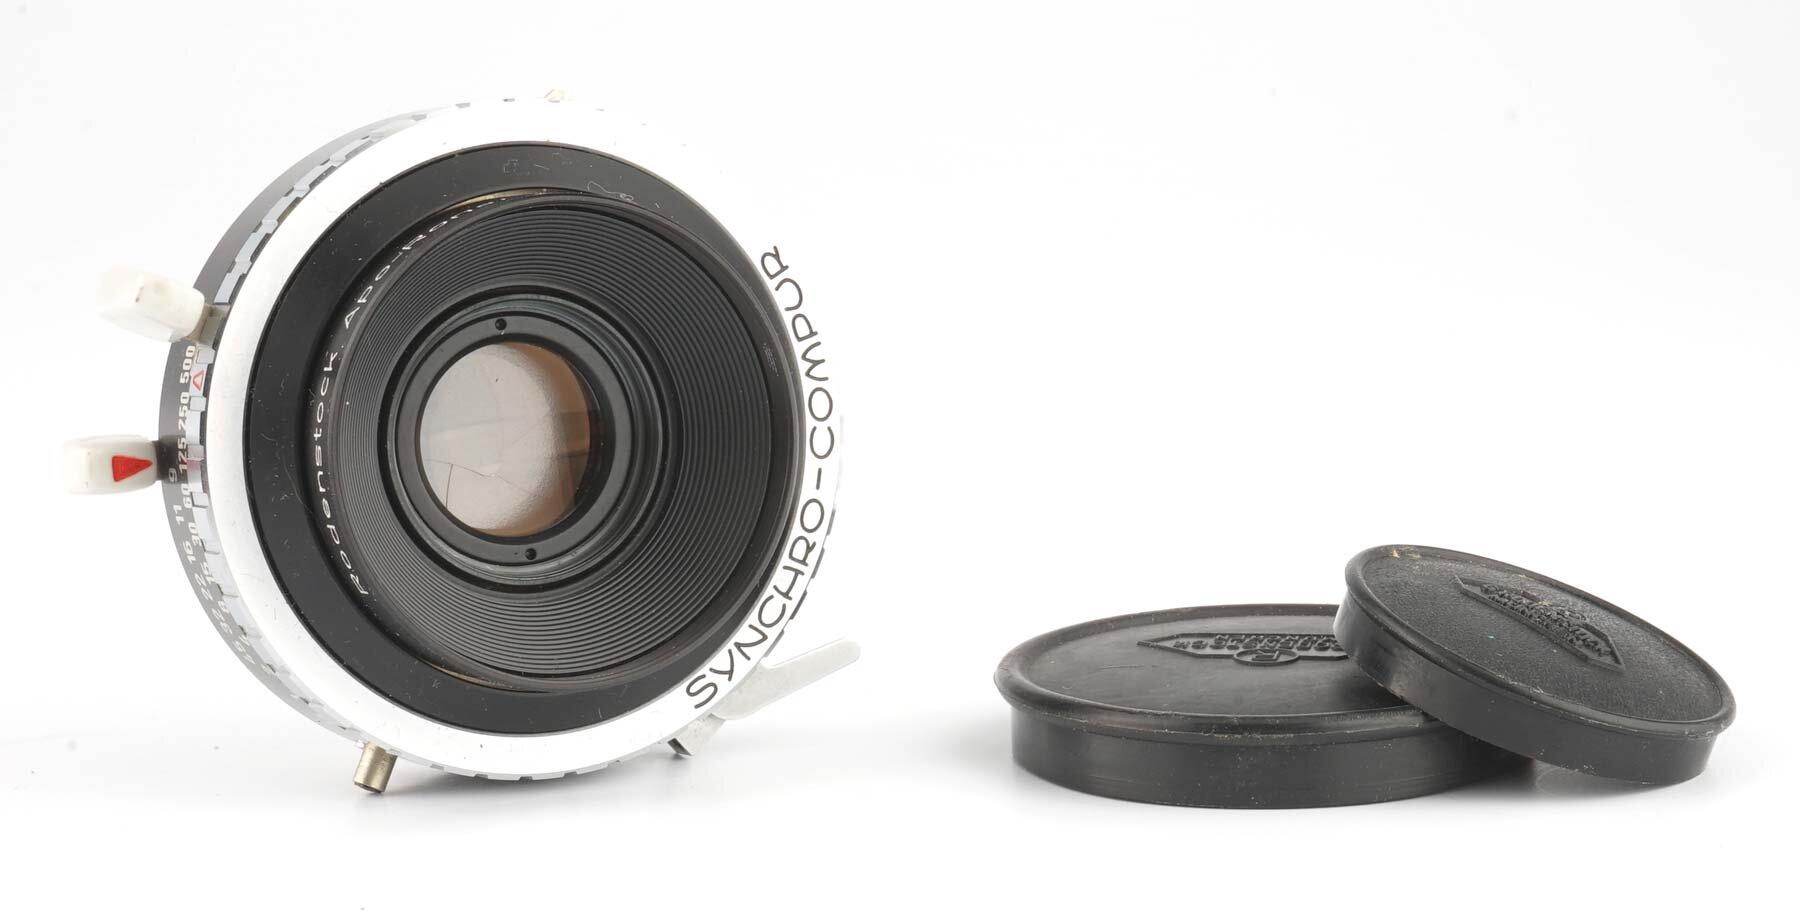 Rodenstock Apo Ronar 9/150mm im Synchro-Compur